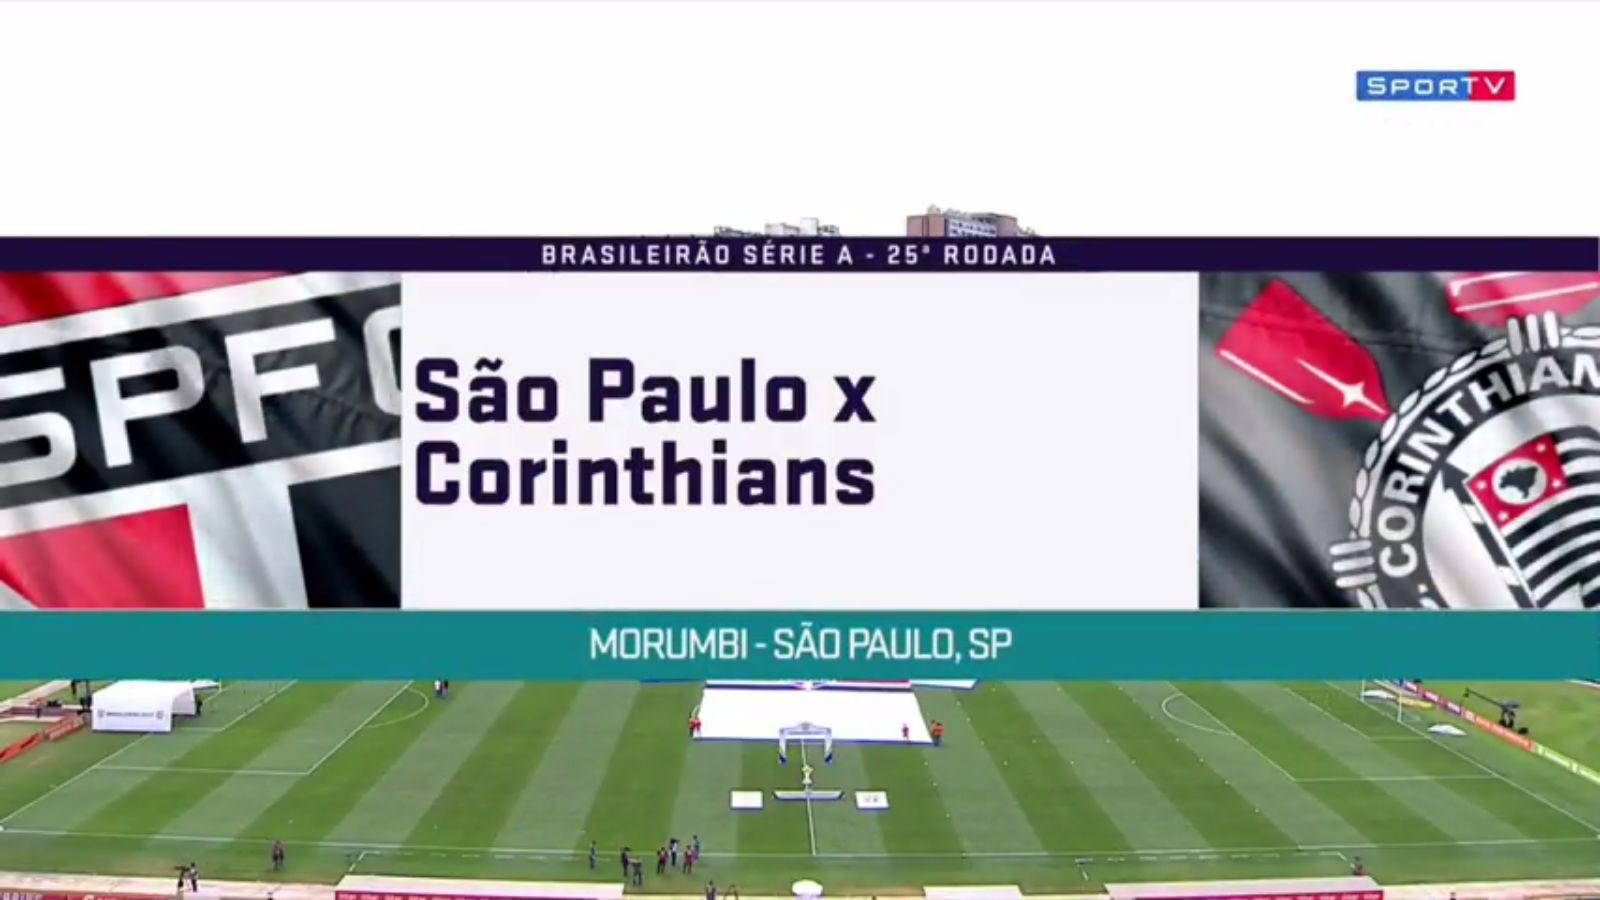 24-09-2017 - Sao Paulo 1-1 Corinthians